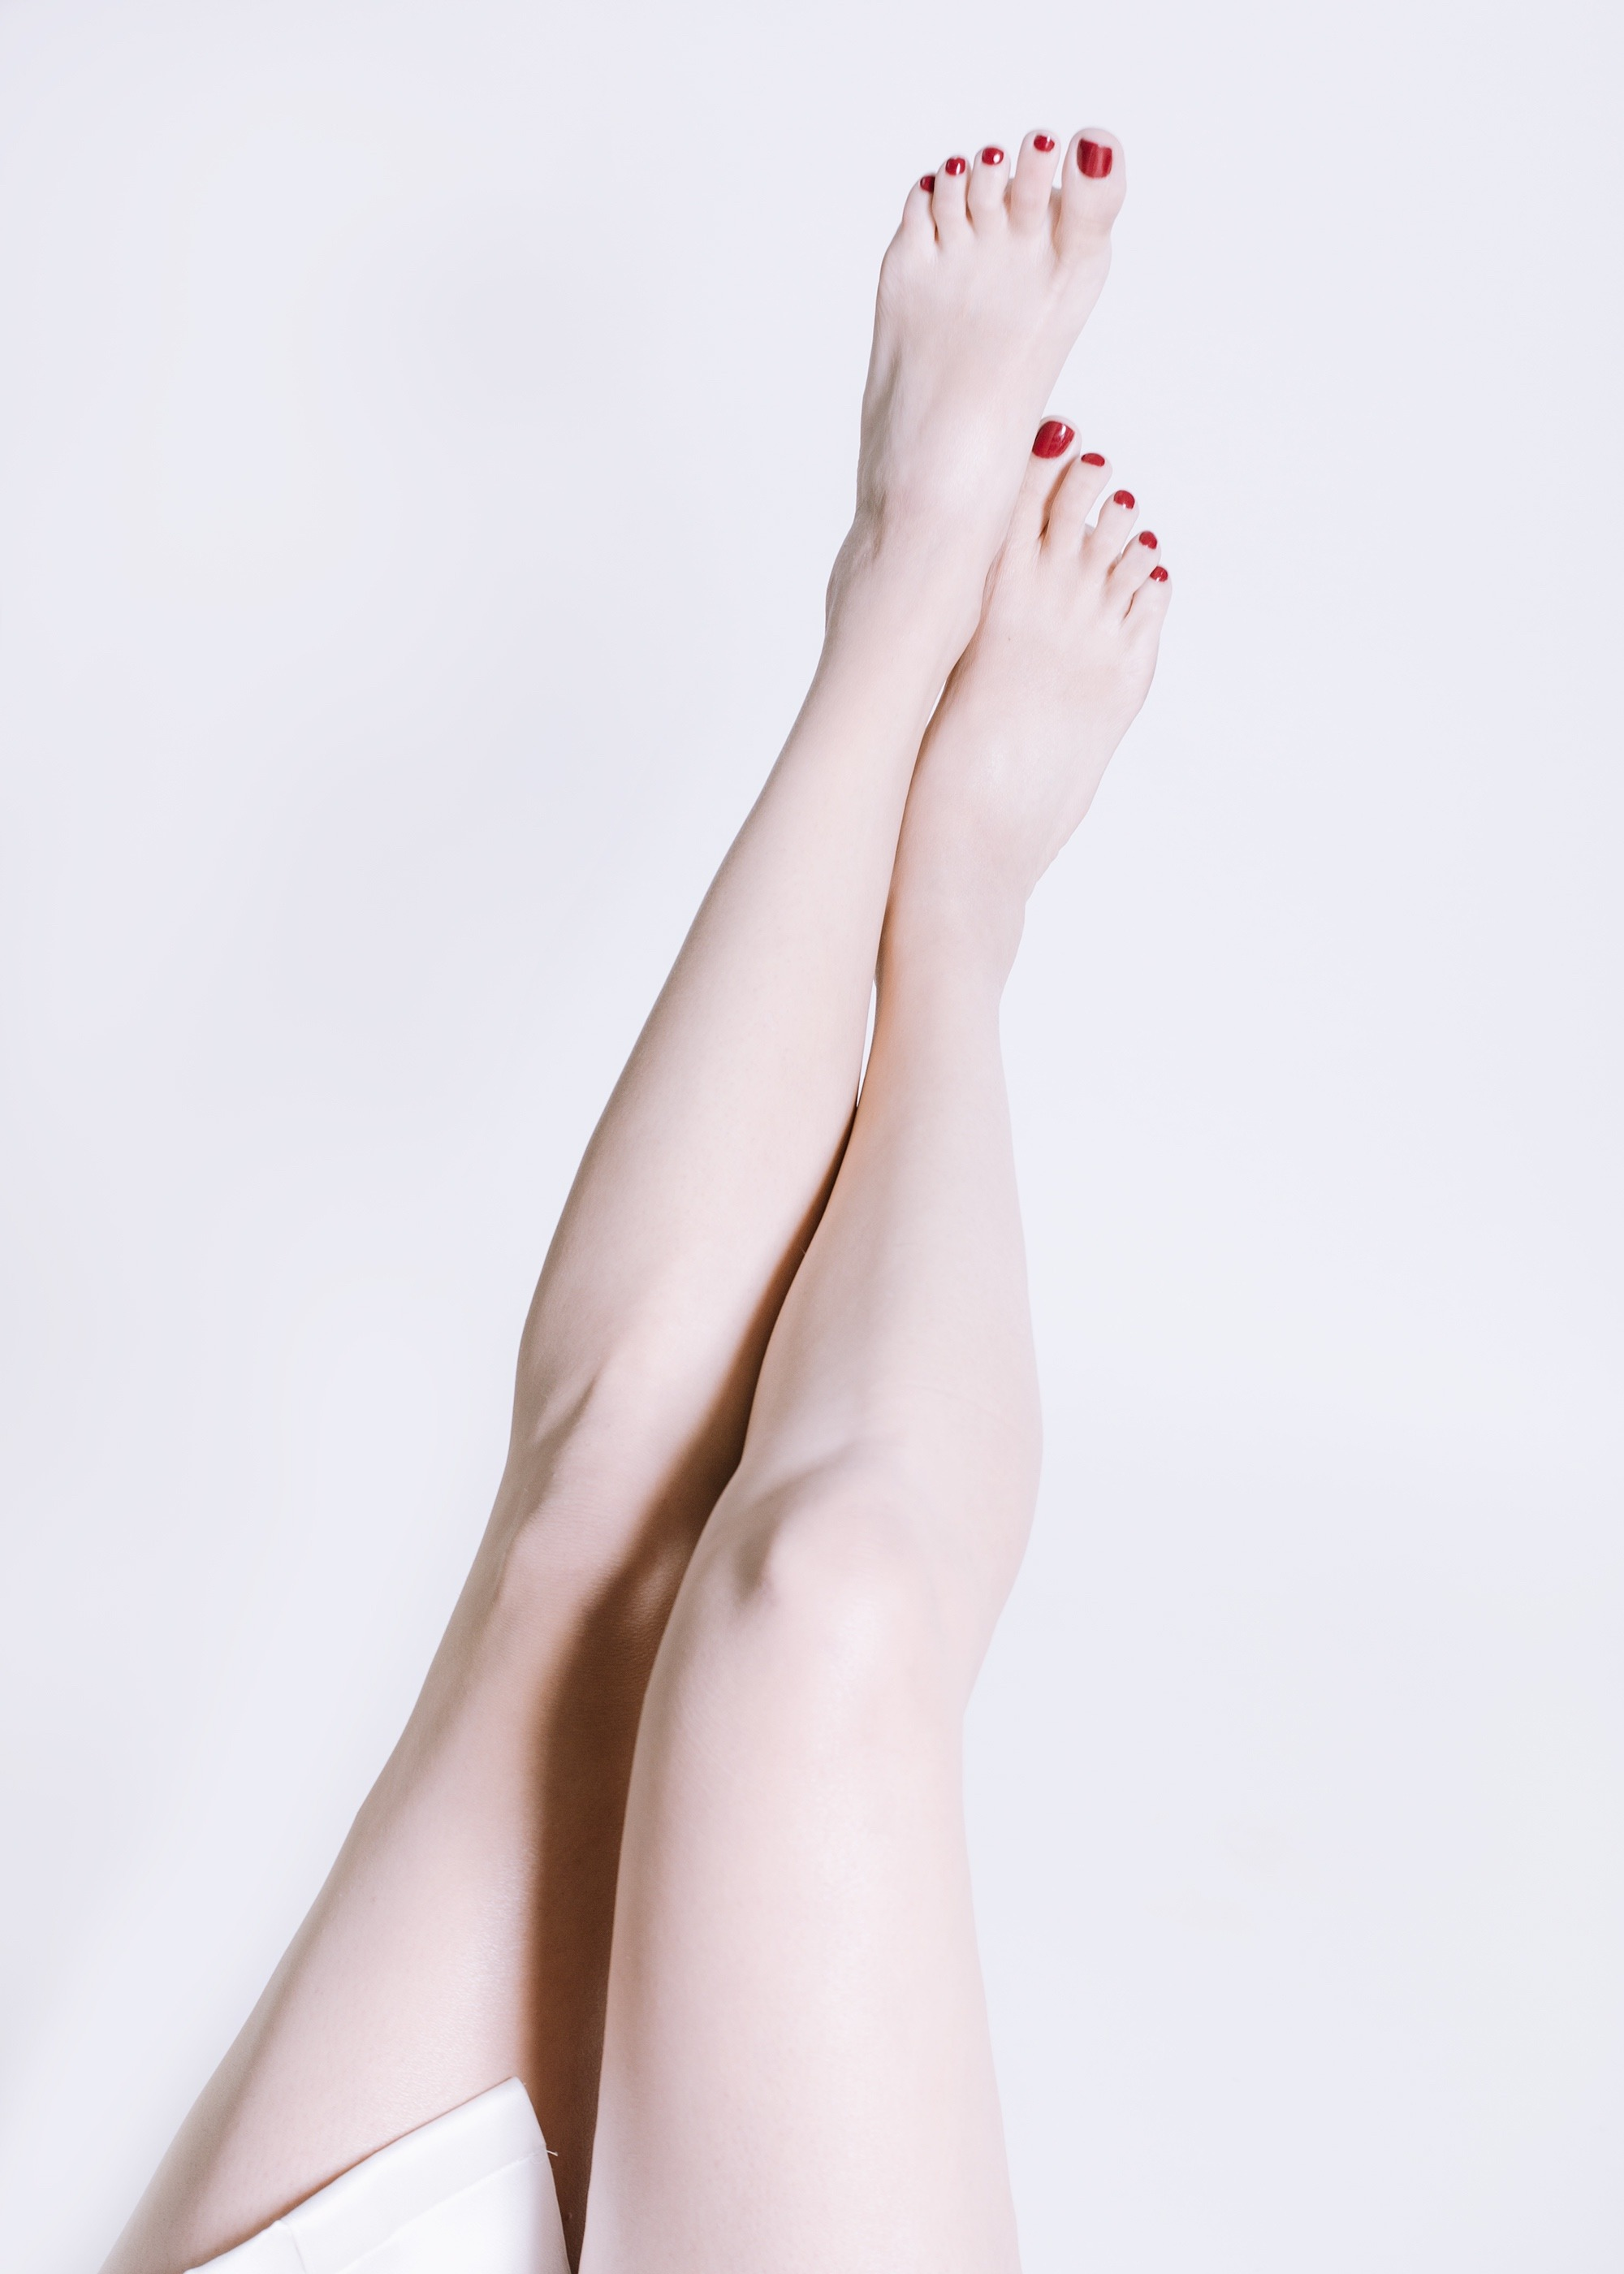 sophia-feliciano_feet1